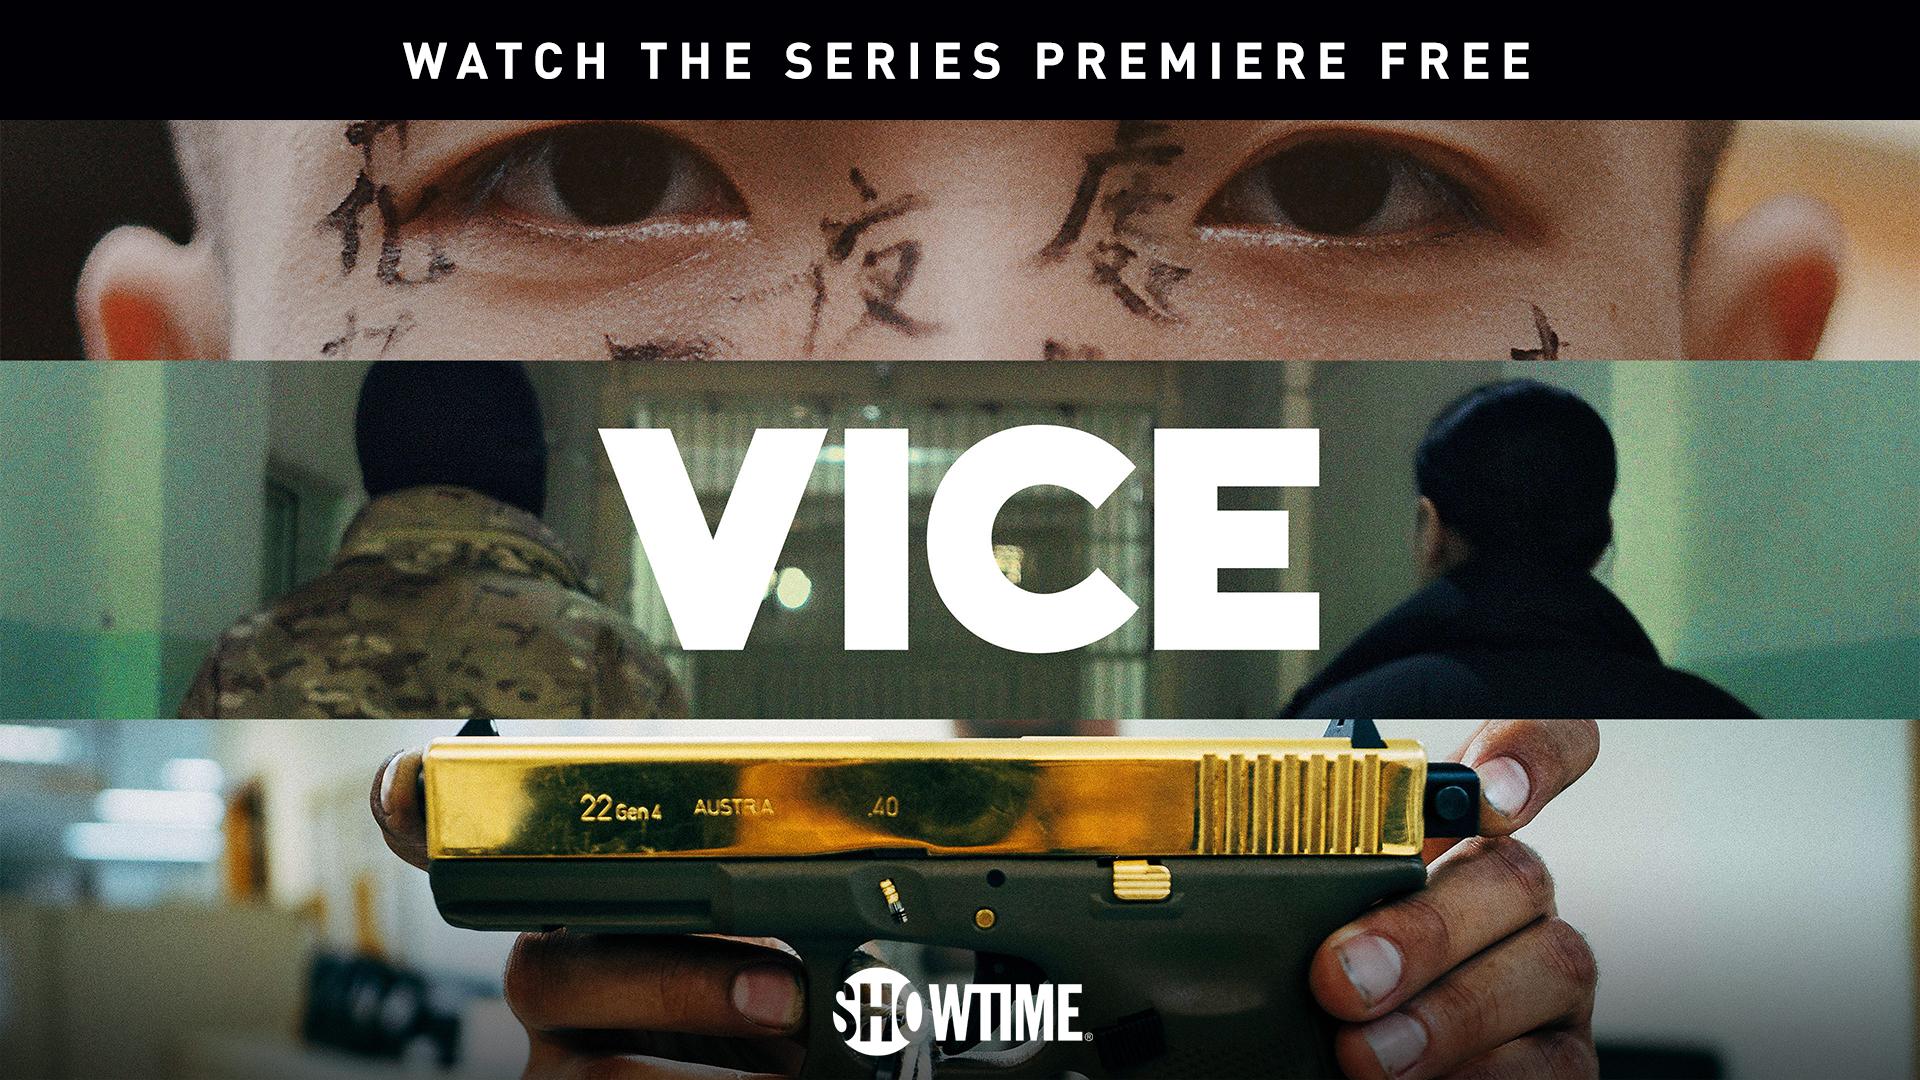 VICE Season 1